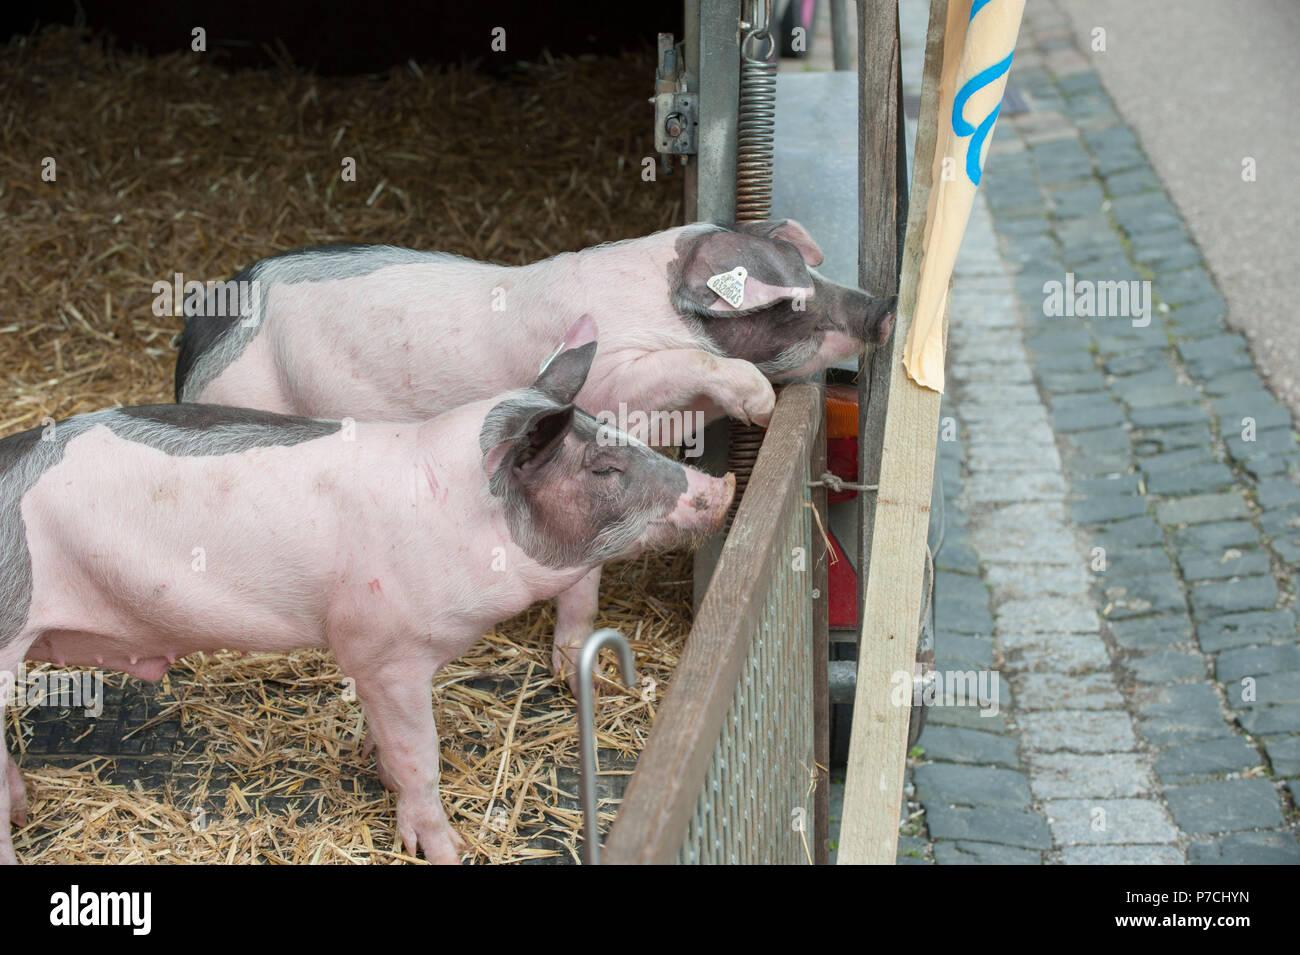 Swabian Hall pig, Schwaebisch Hall, Hohenlohe region, Baden-Wuerttemberg, Heilbronn-Franconia, Germany - Stock Image